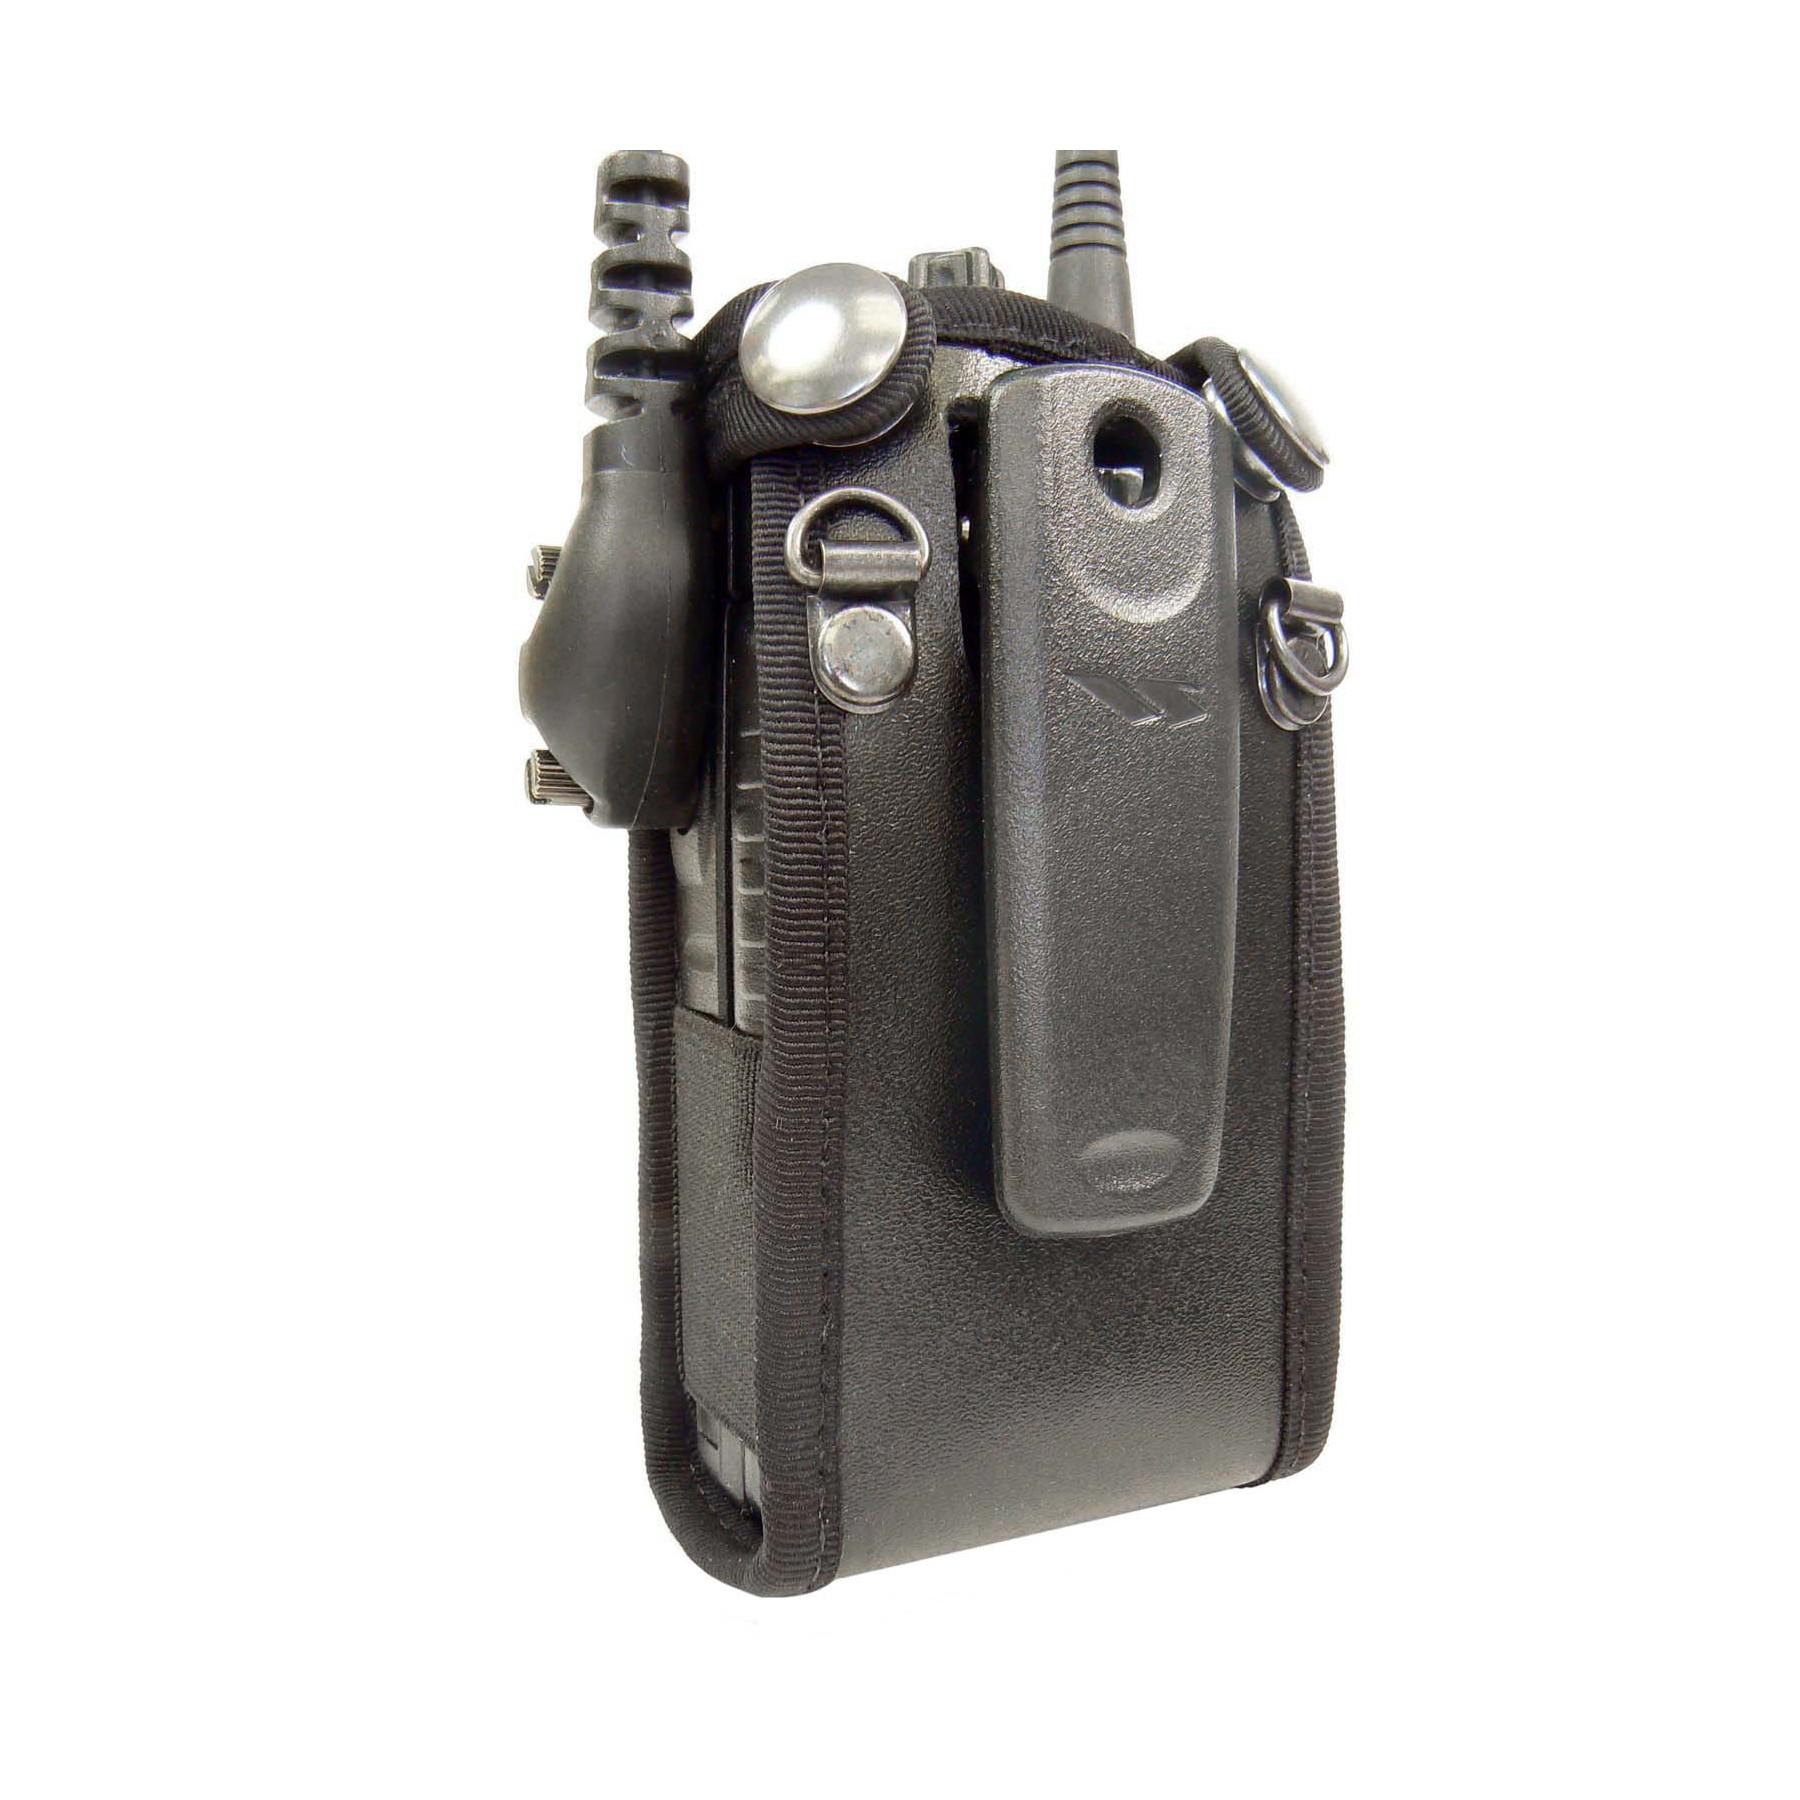 Vertex Yaesu VX231 Radio Case leather